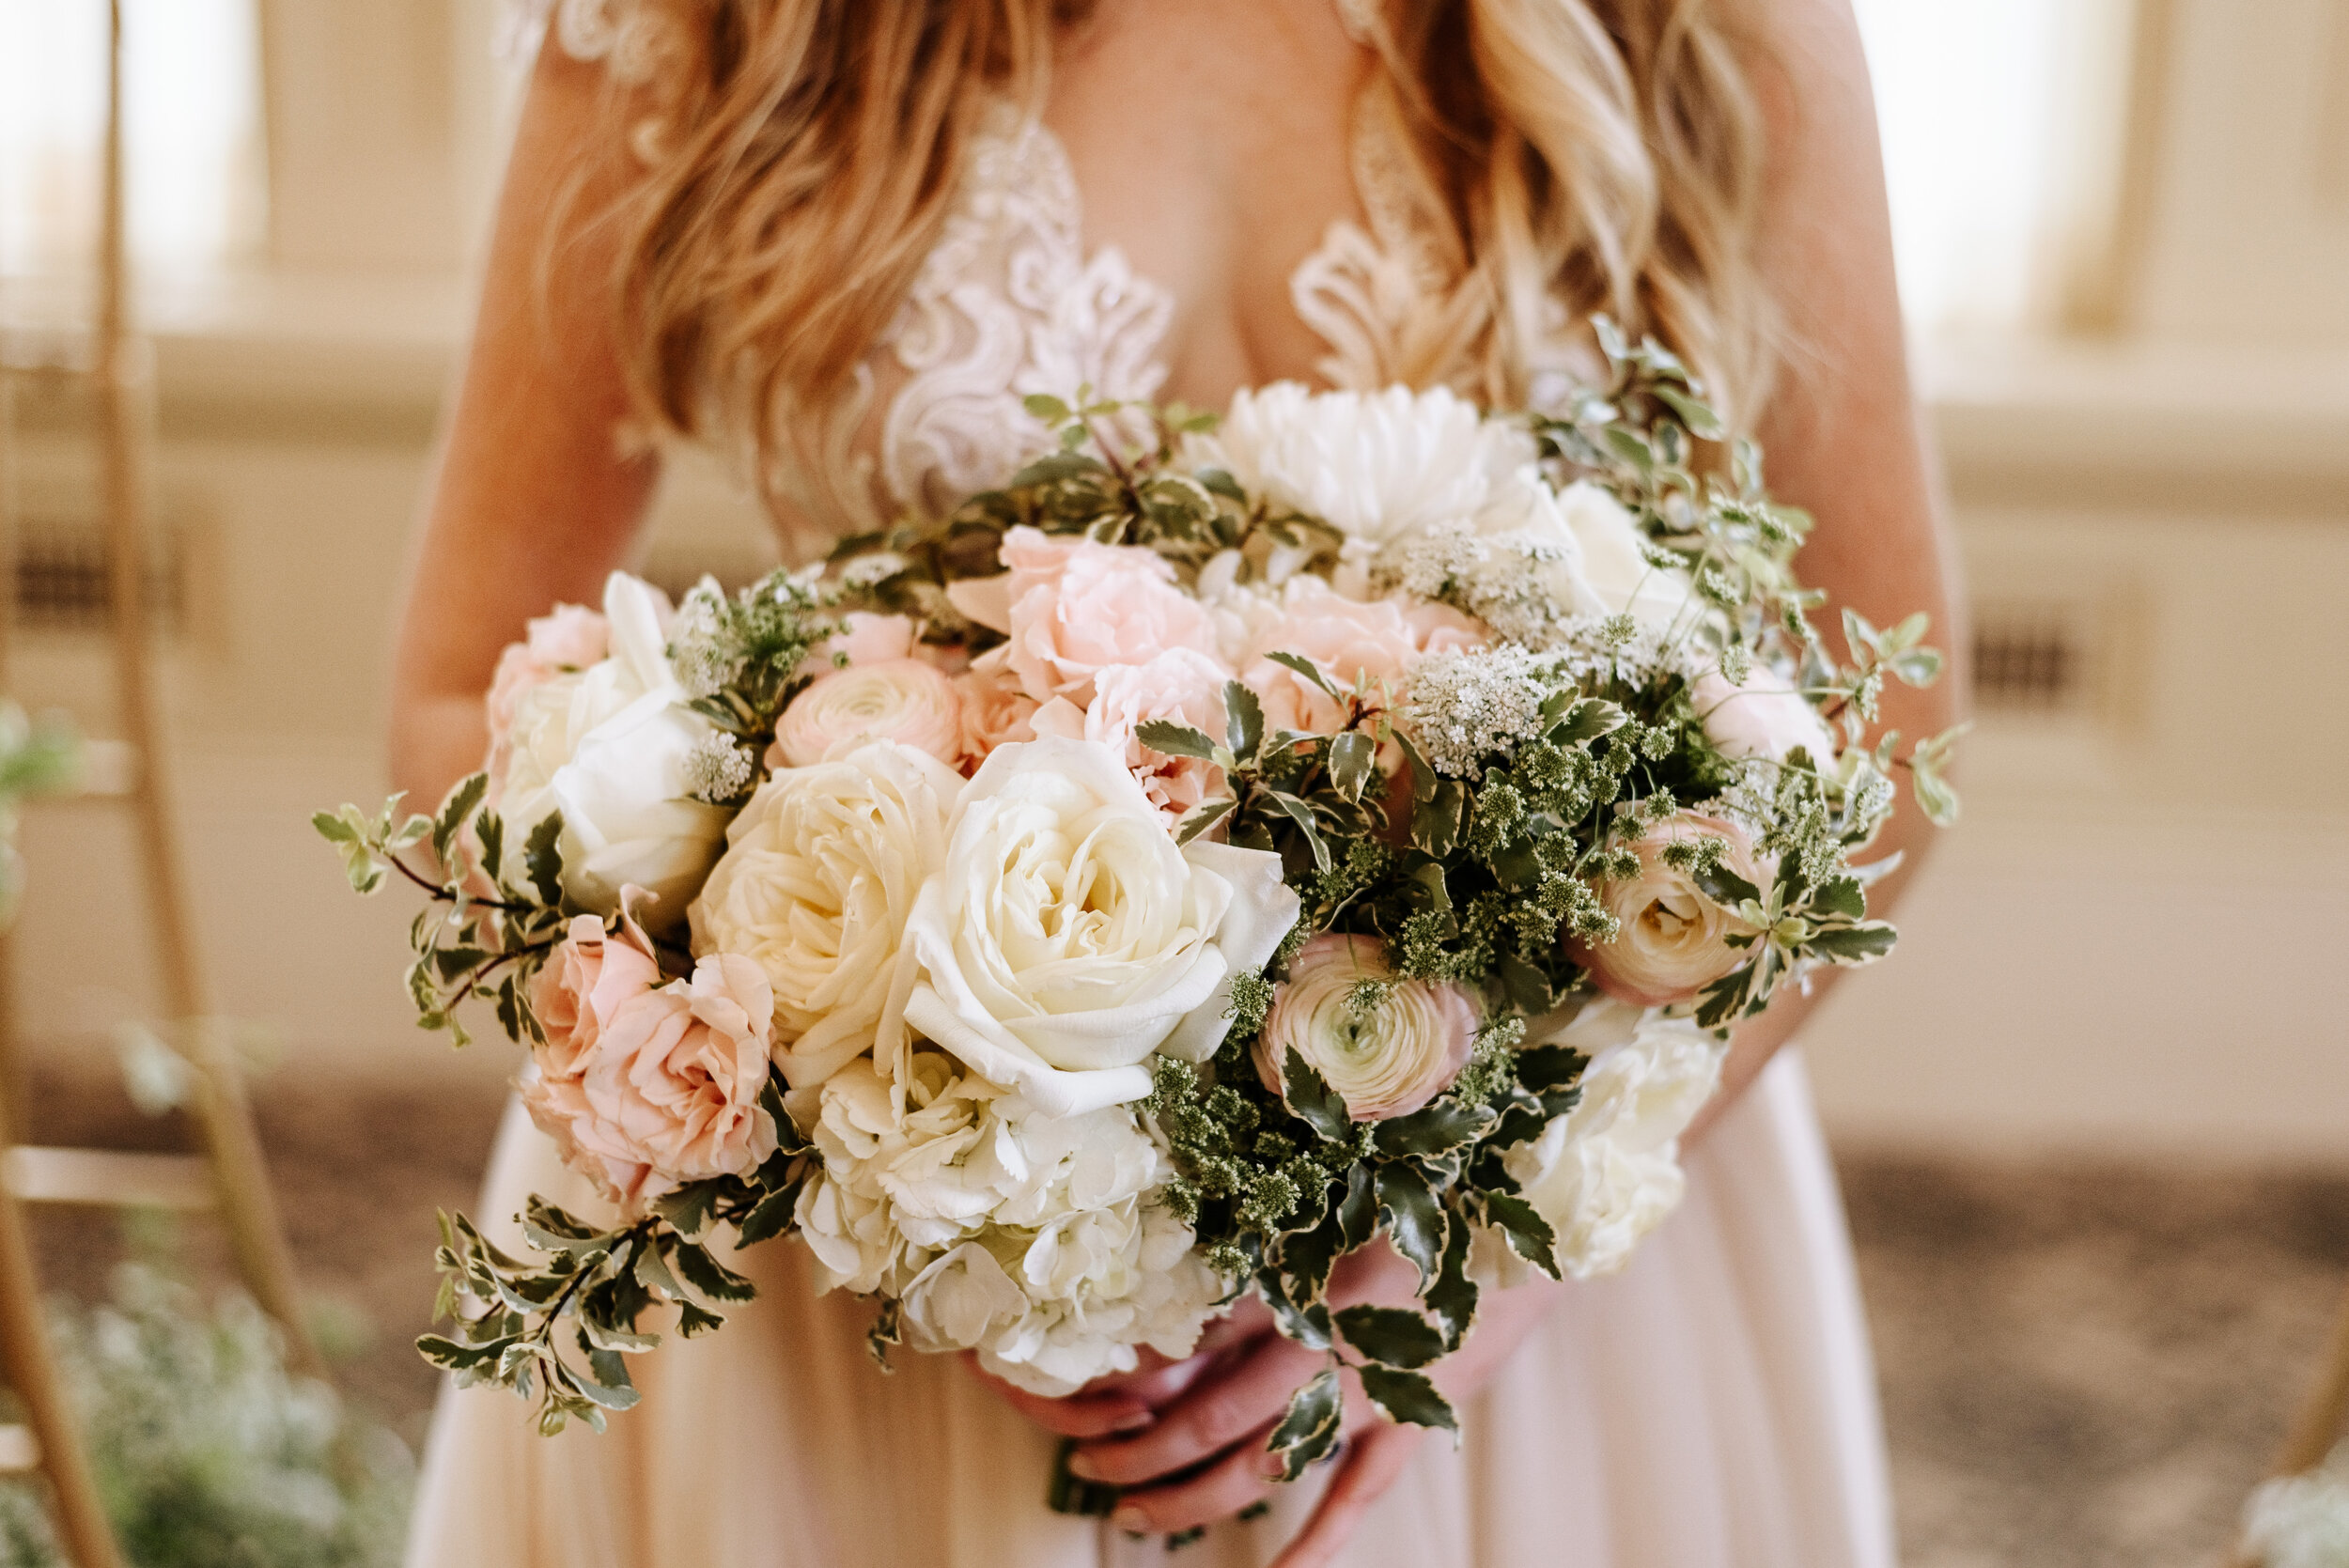 Cassie-Mrunal-Wedding-Quirk-Hotel-John-Marshall-Ballrooms-Richmond-Virginia-Photography-by-V-81.jpg